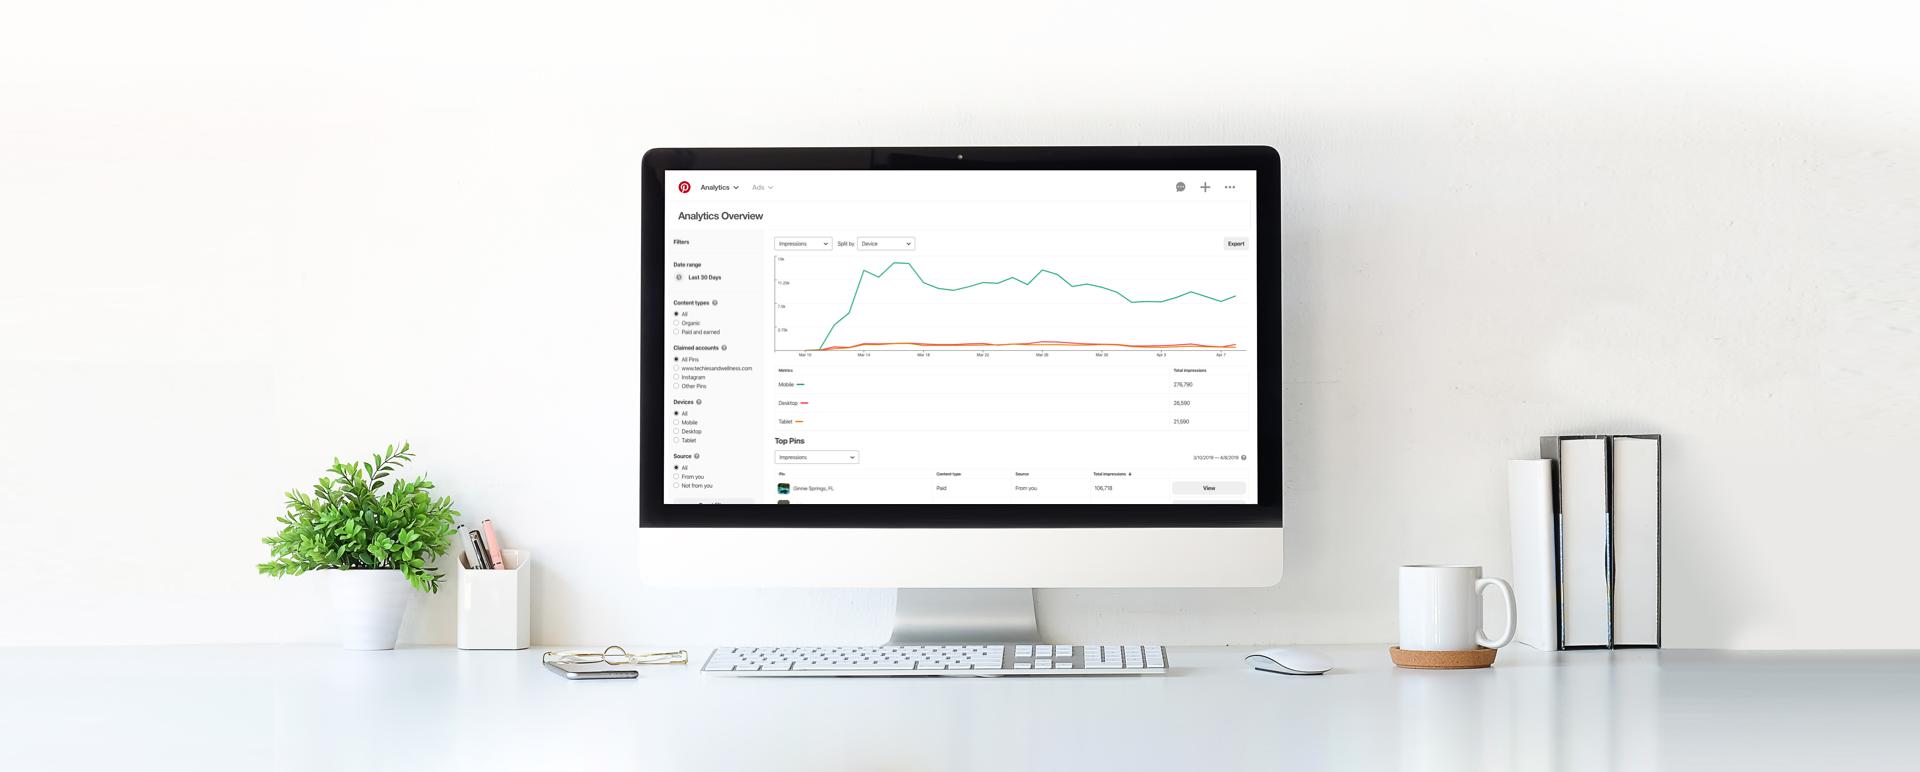 Background image showing Pinterest Analytics page